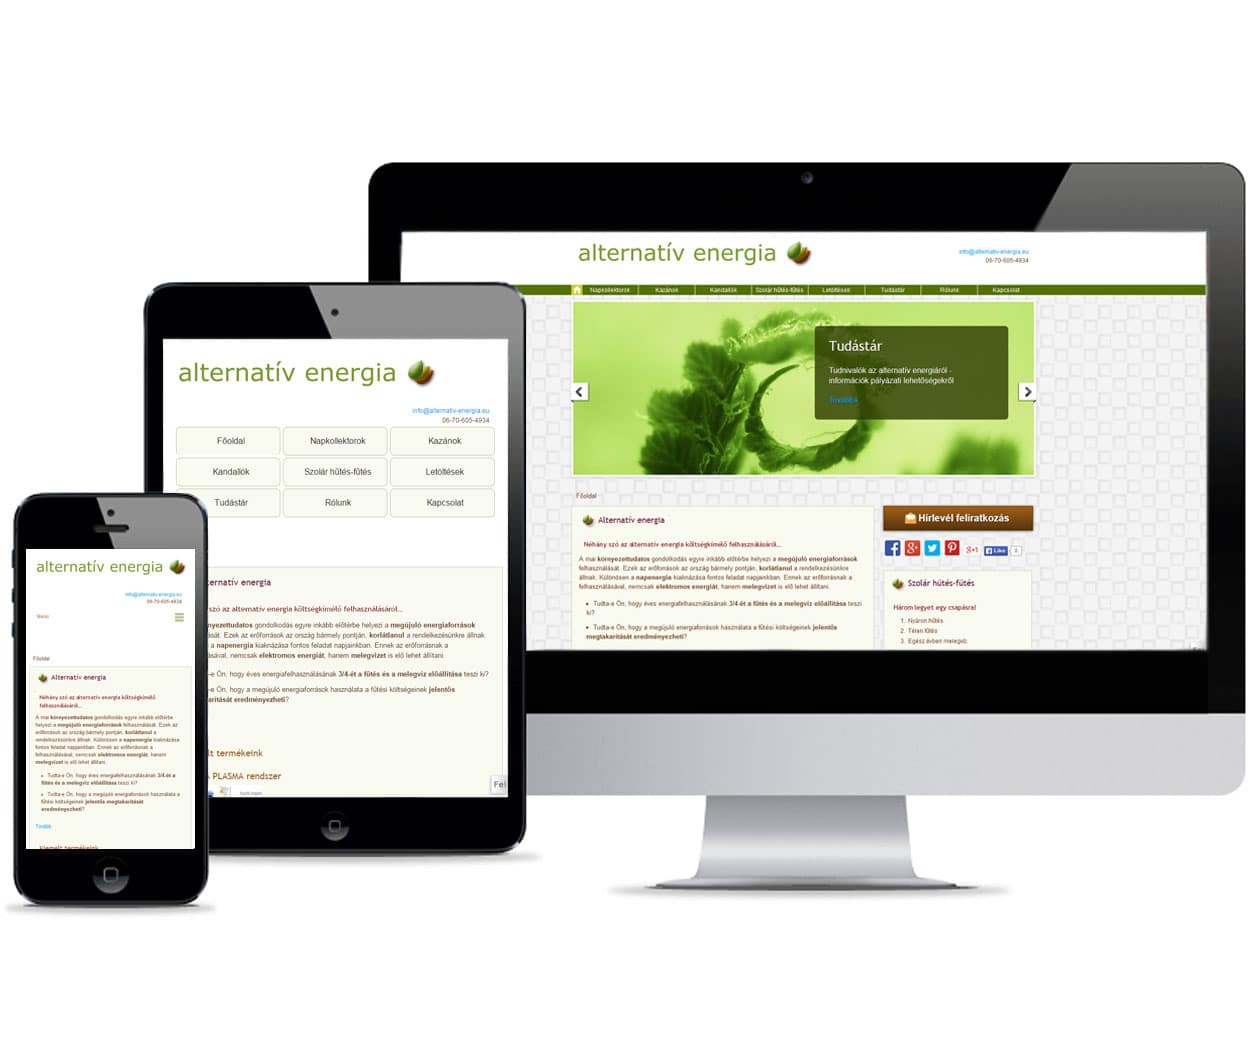 alternativ-energia-mobile